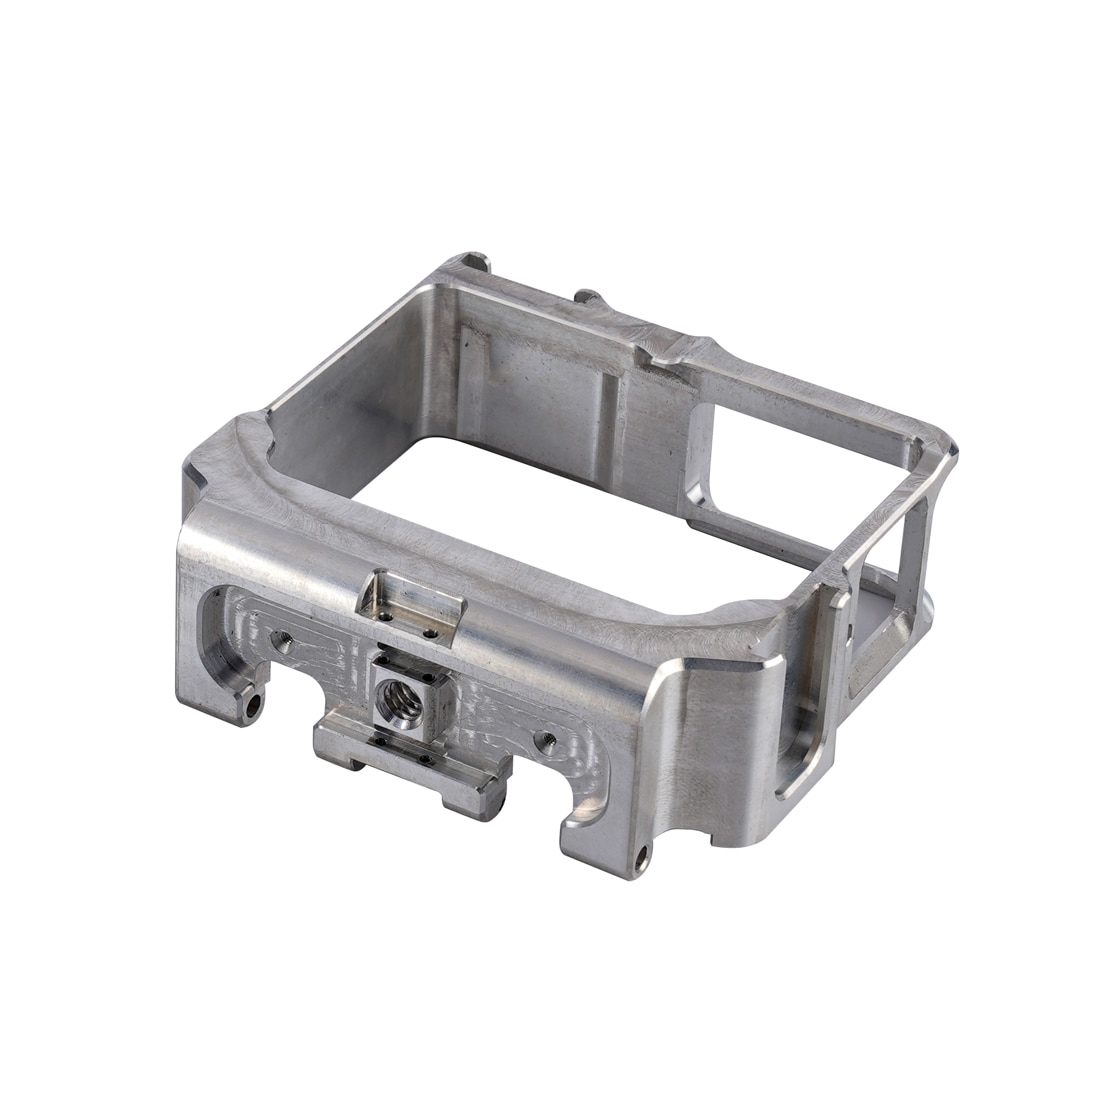 factory OEM supply High precision 6061 aluminum part machining metal parts cnc rapid service aluminum pr